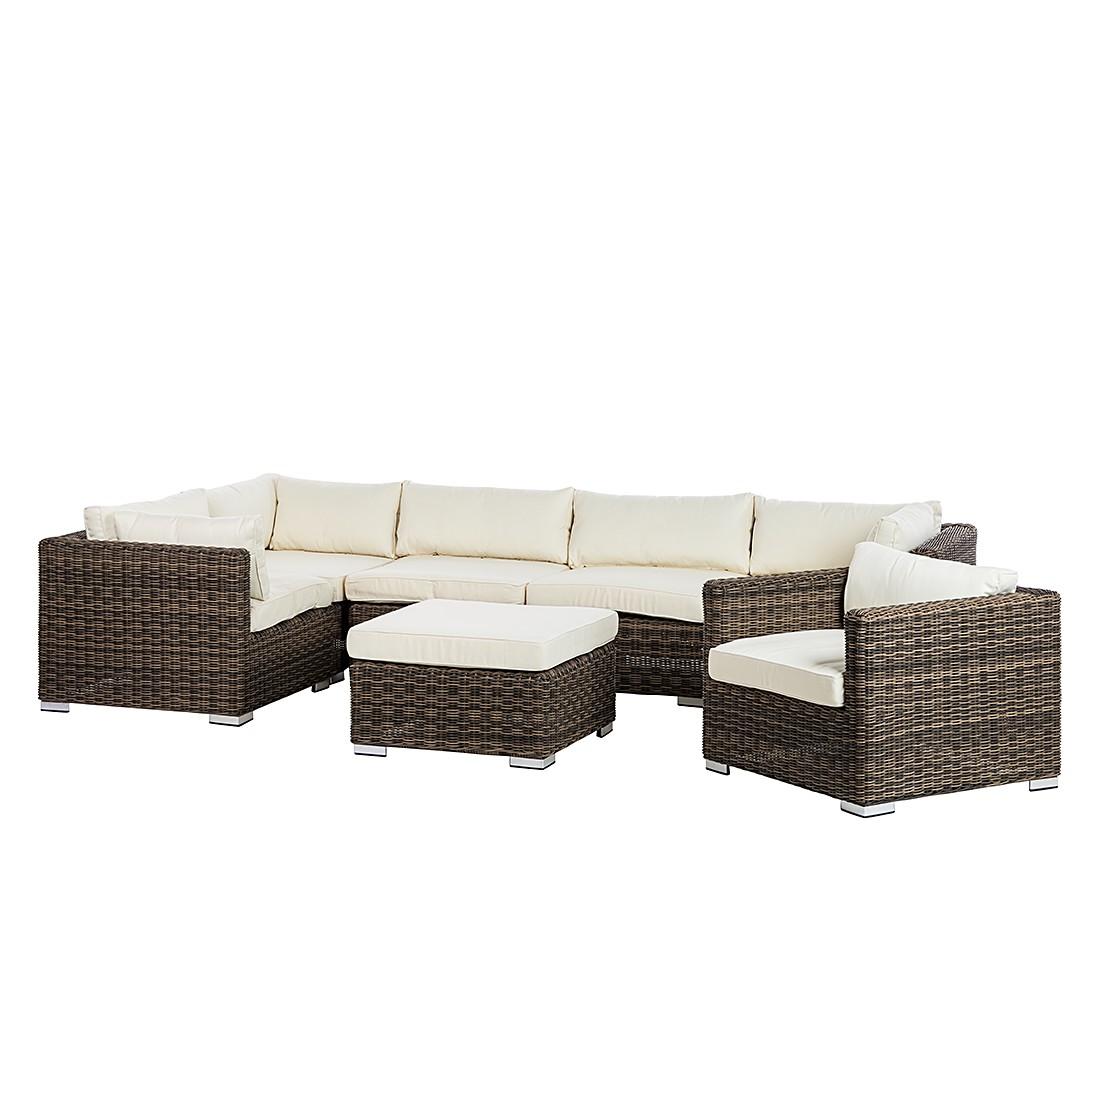 Lounge-Set Royal Comfort (7-teilig) - Polyrattan/Textil - Braun/Beige, Chateau Garden